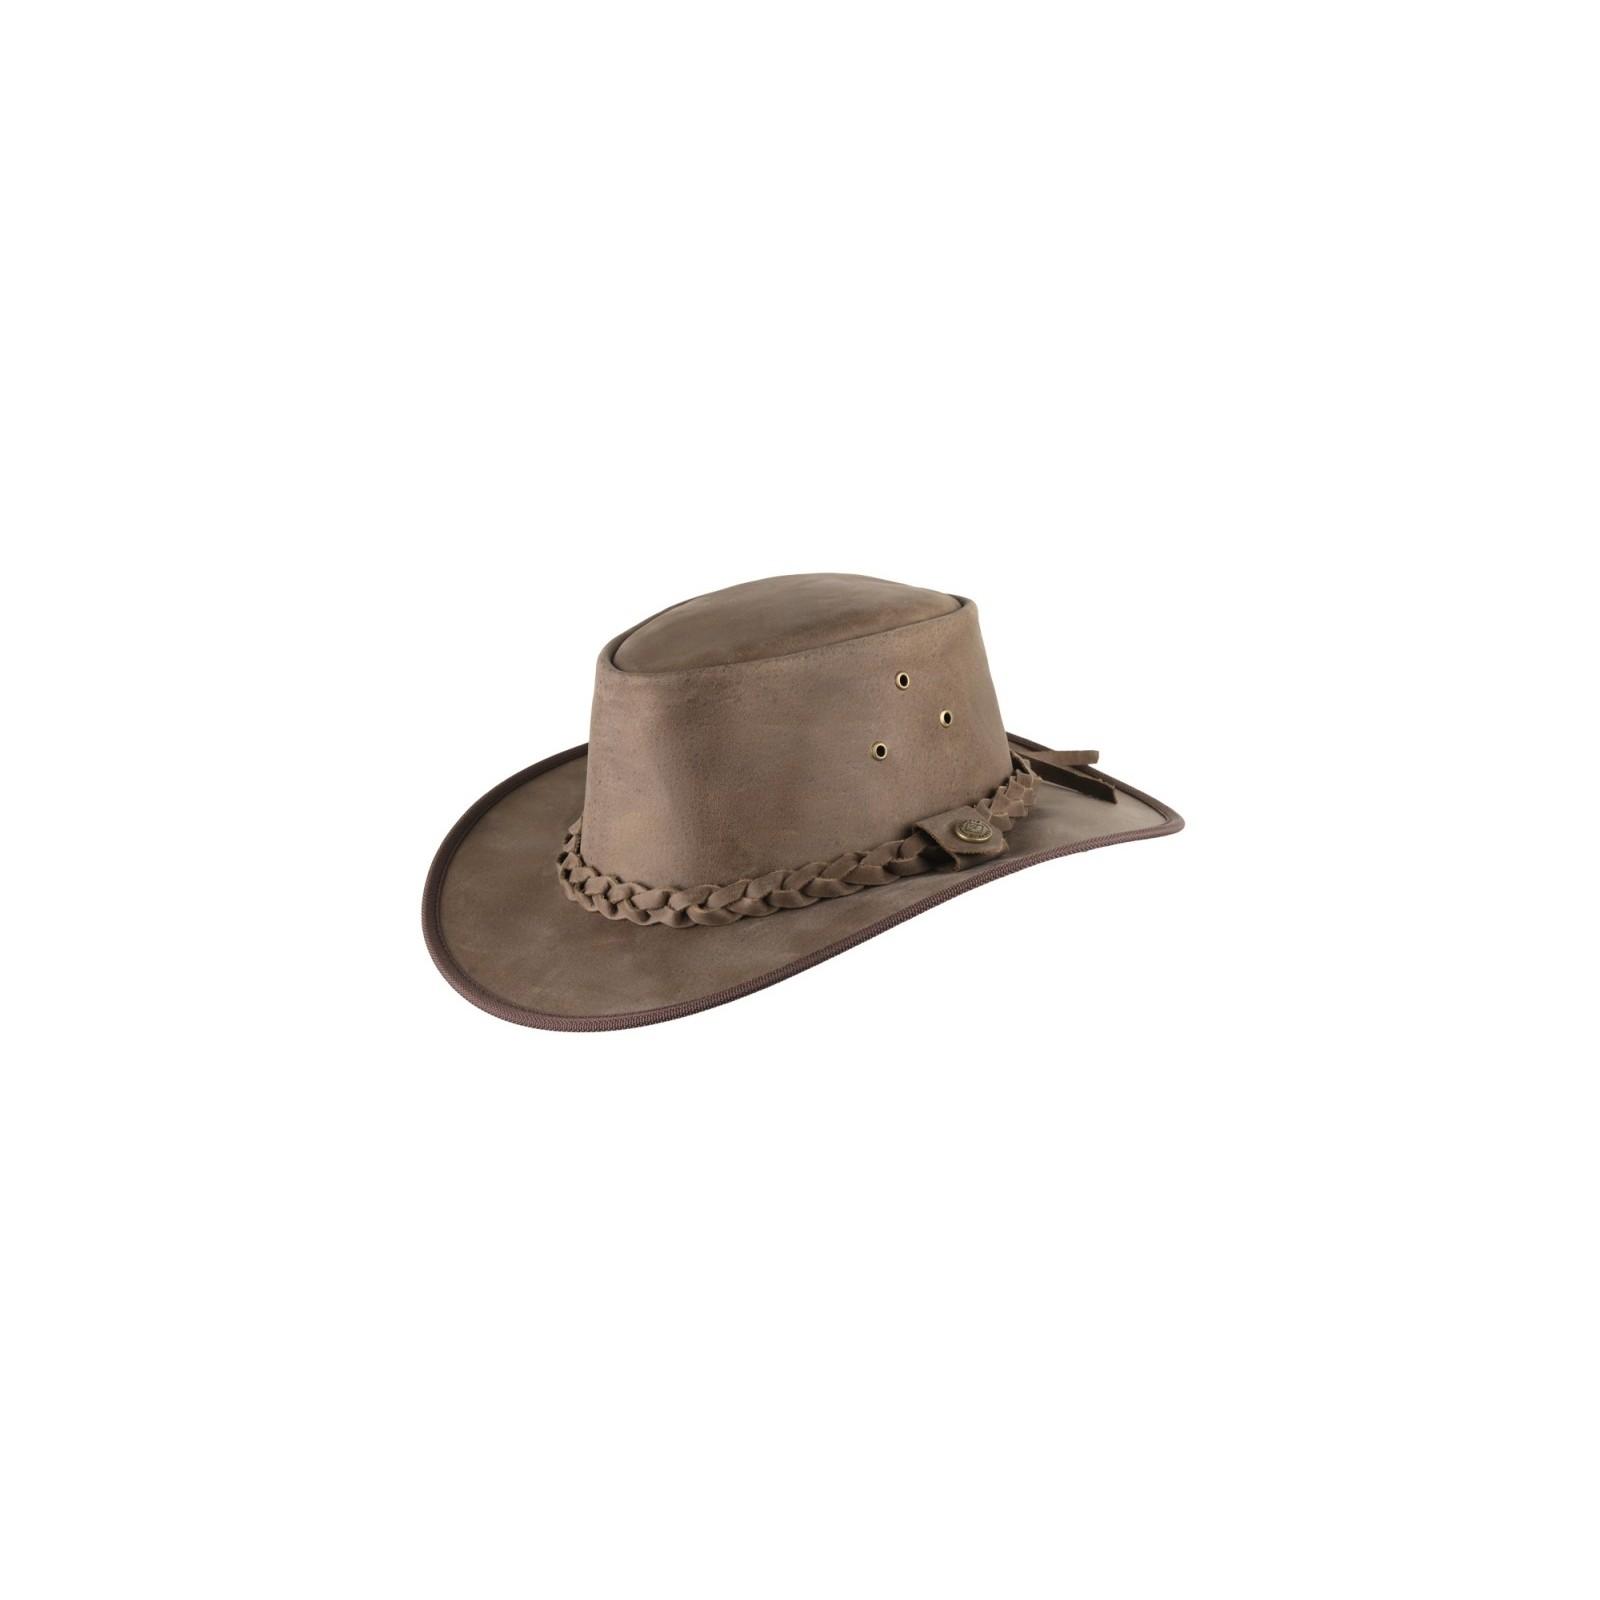 Scippis Porter leather hat